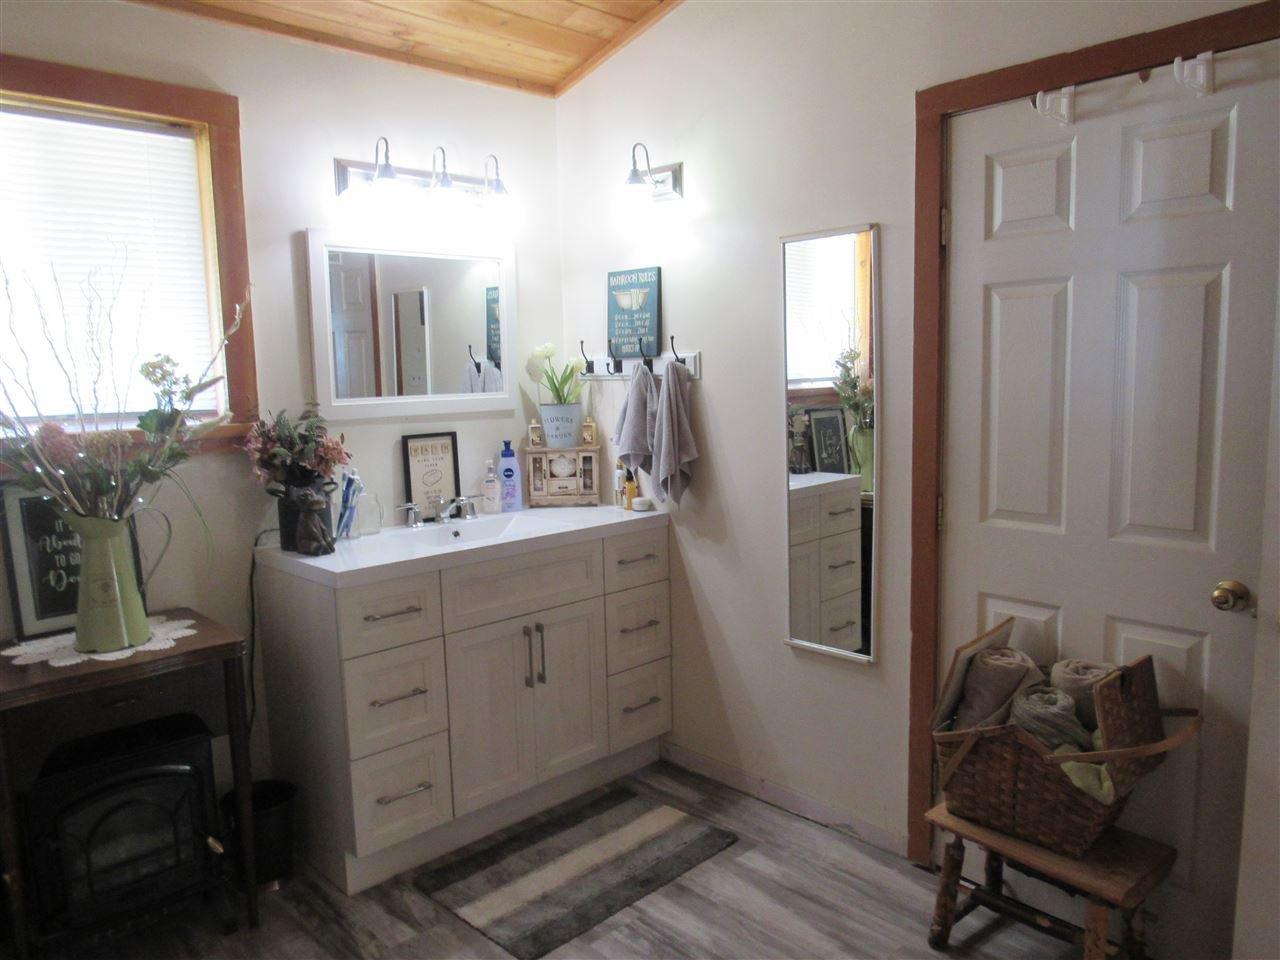 Photo 26: Photos: 3126 ELSEY Road in Williams Lake: Williams Lake - Rural West House for sale (Williams Lake (Zone 27))  : MLS®# R2467730